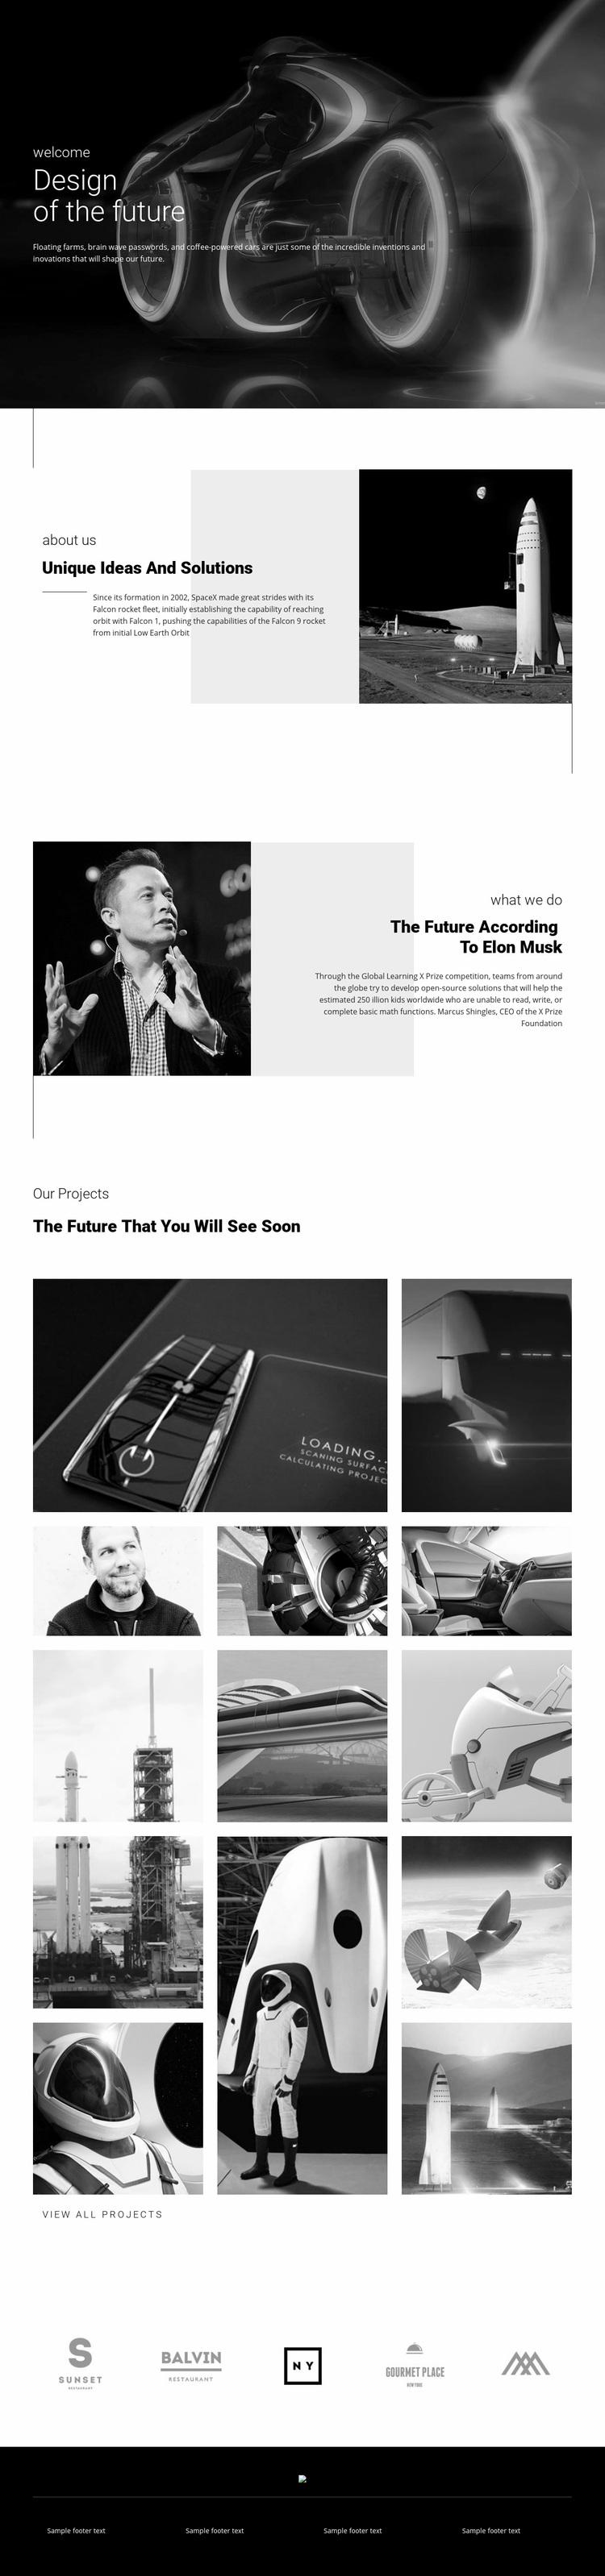 Design of future technology Web Page Designer